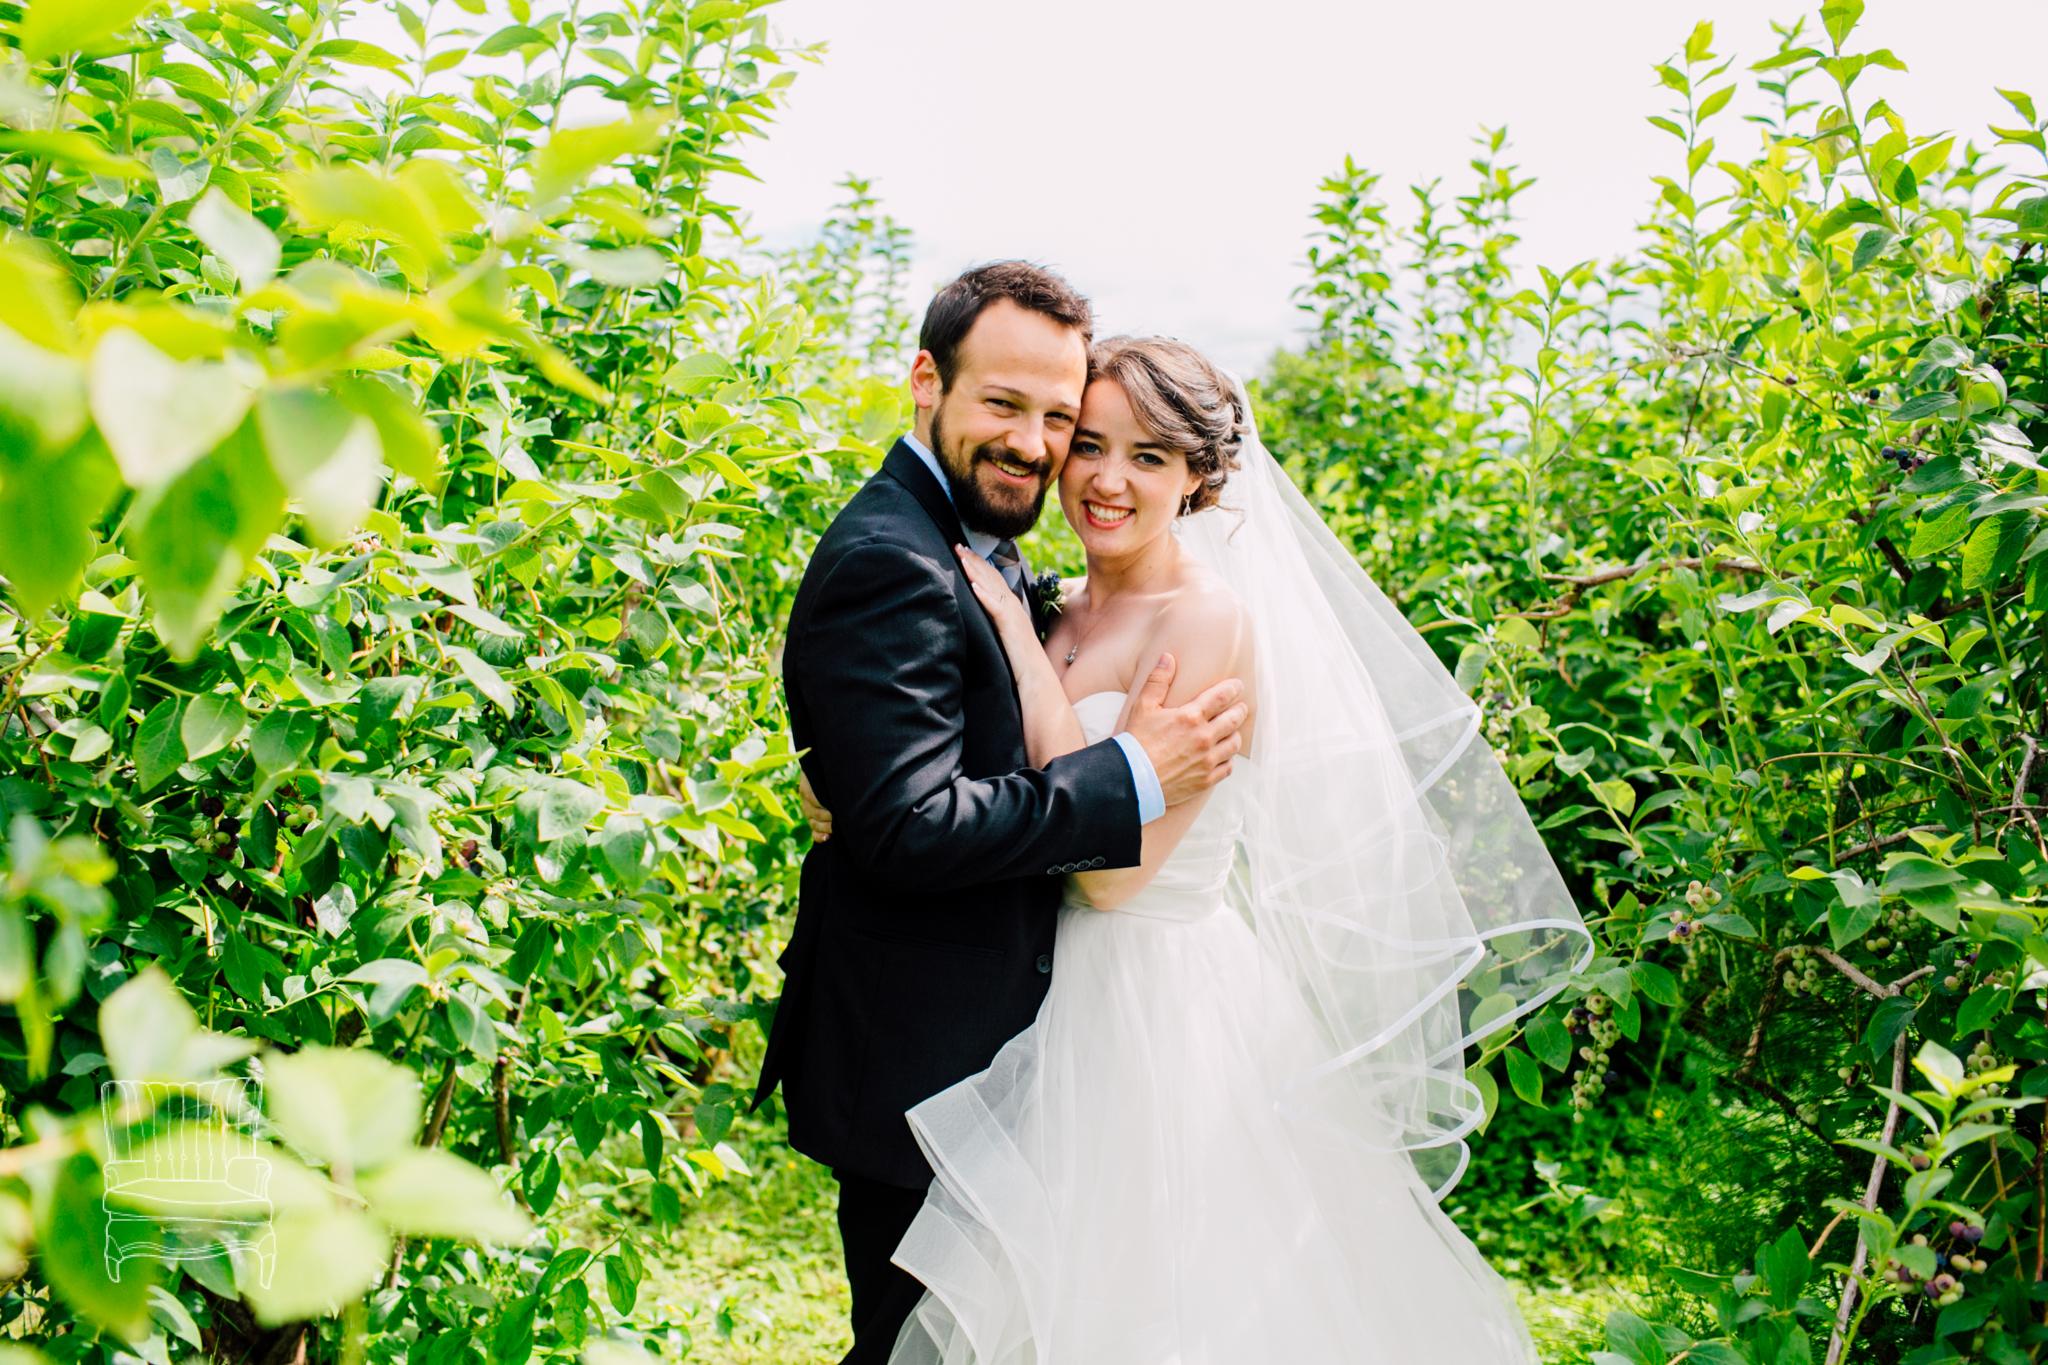 bybee-farms-north-bend-washington-wedding-allison-jon-32.jpg